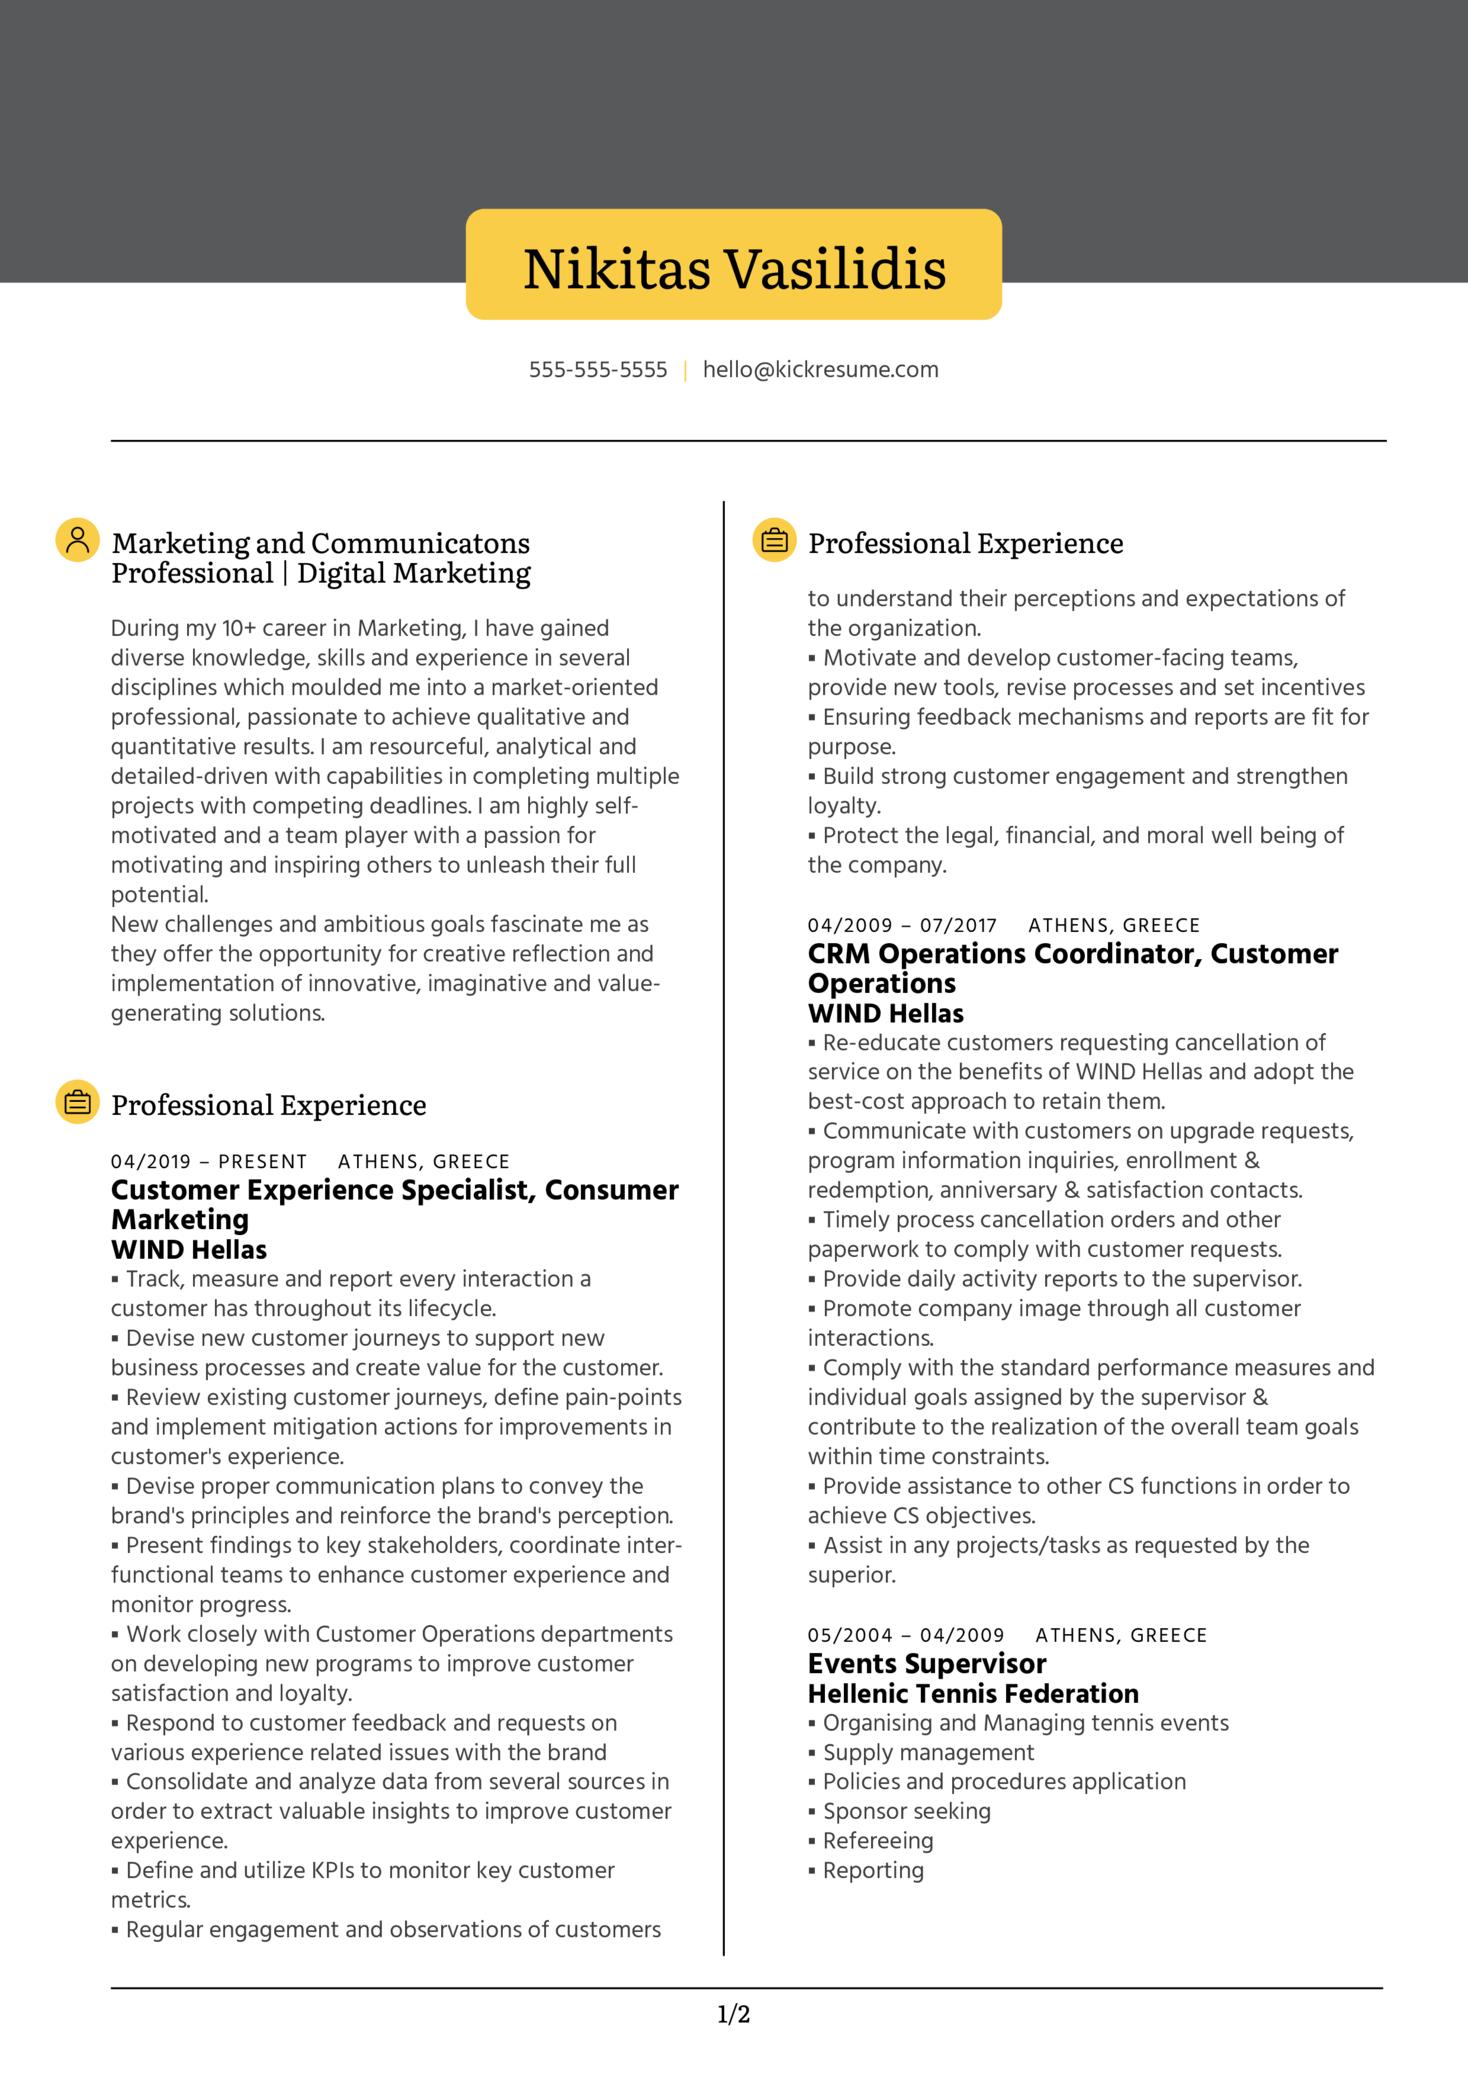 Digital Marketer Resume Example (Teil 1)